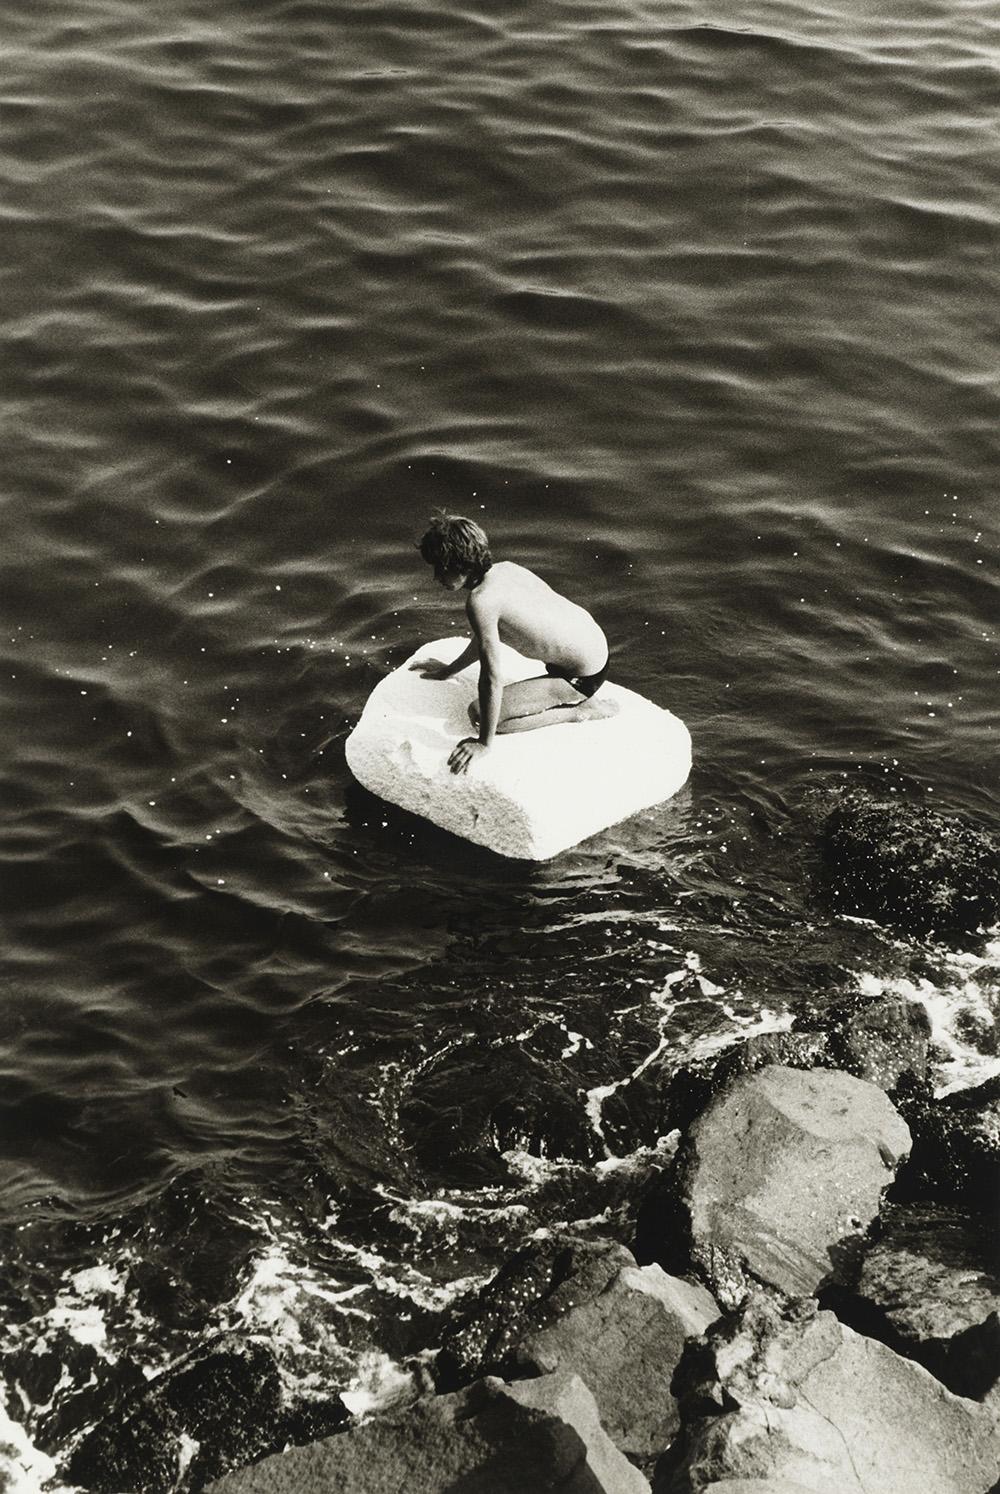 Boy On Raft (1978) © Peter Hujar Archive, LLC, courtesy Pace/MacGill Gallery, New York and Fraenkel Gallery,San Francisco